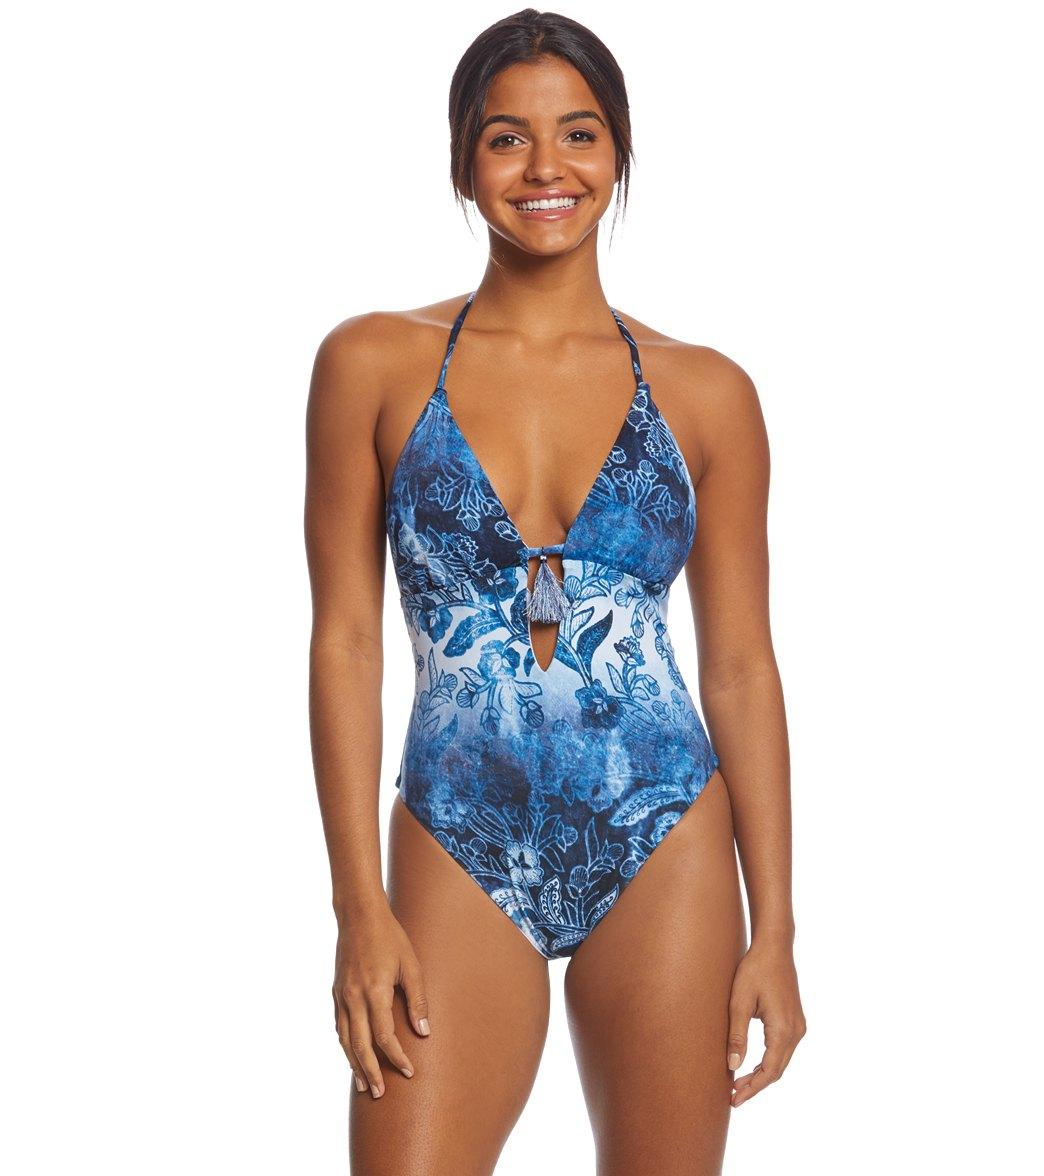 6cd65da2e3f Bikini Lab Indigo Your Own Way High Leg One Piece Swimsuit at  SwimOutlet.com - Free Shipping